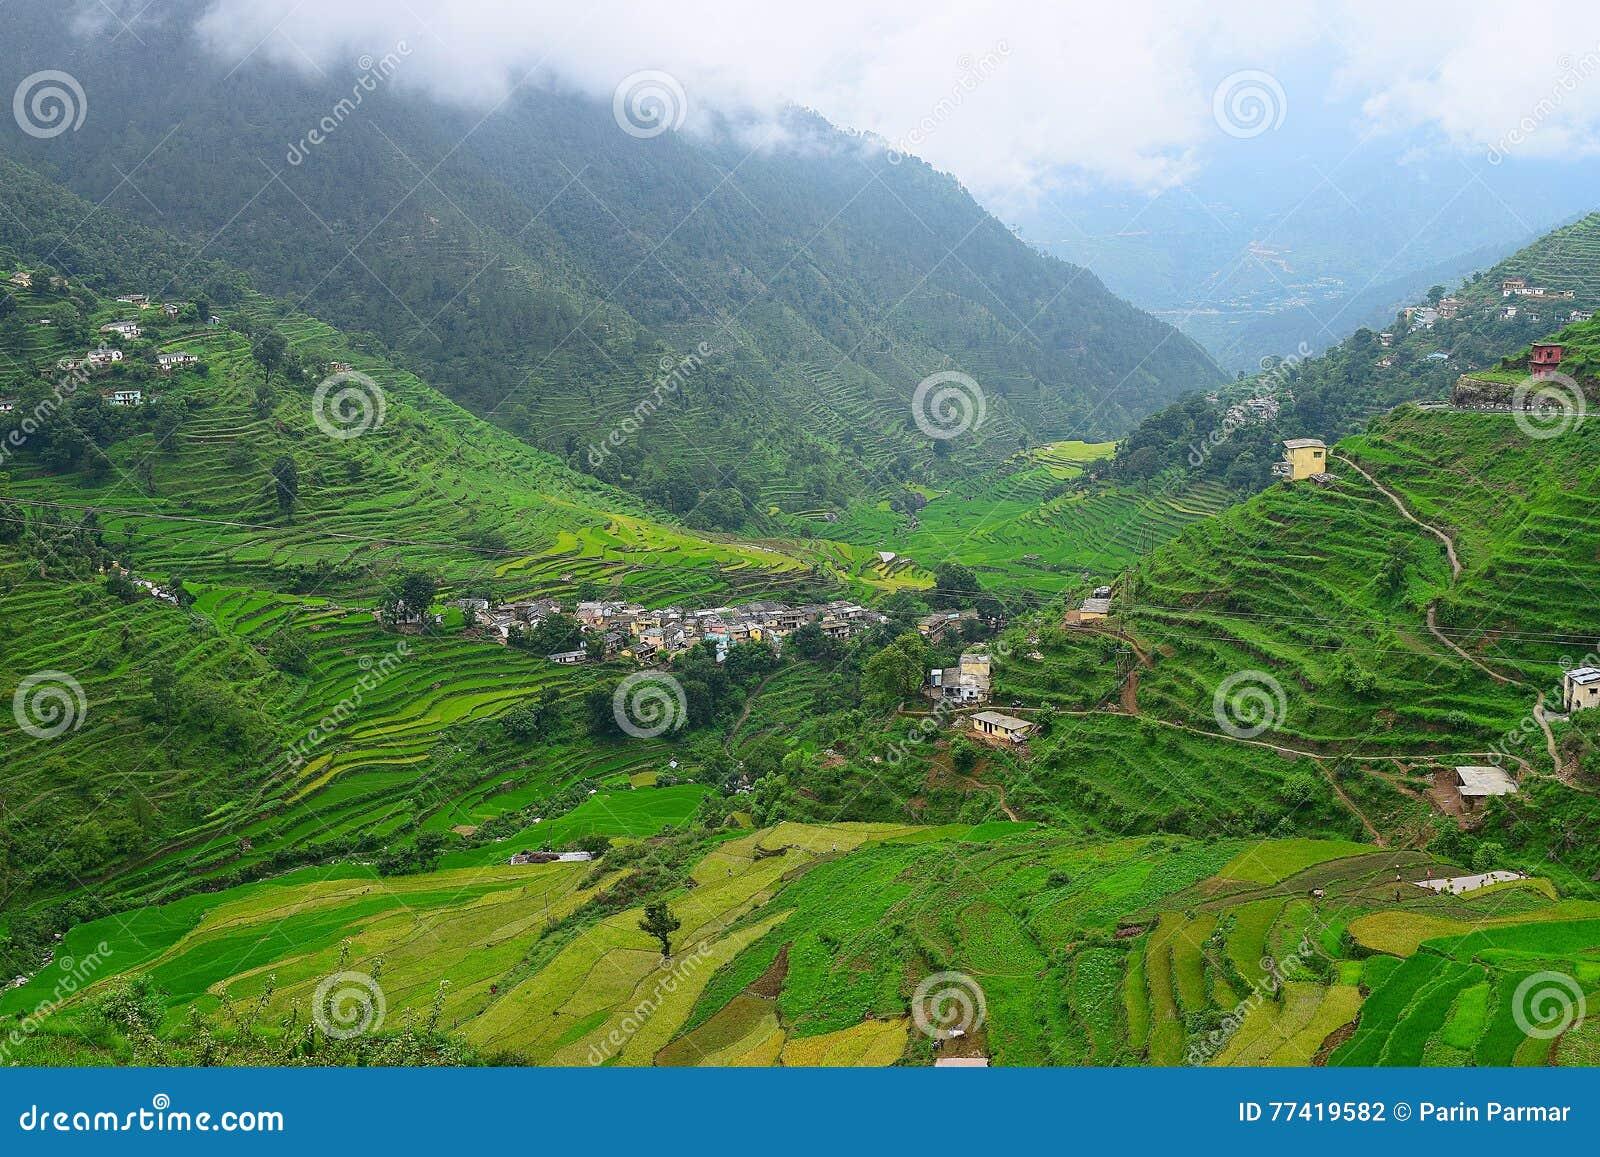 Fermes d étape en vallée de l Himalaya dans Uttarakhand, Inde